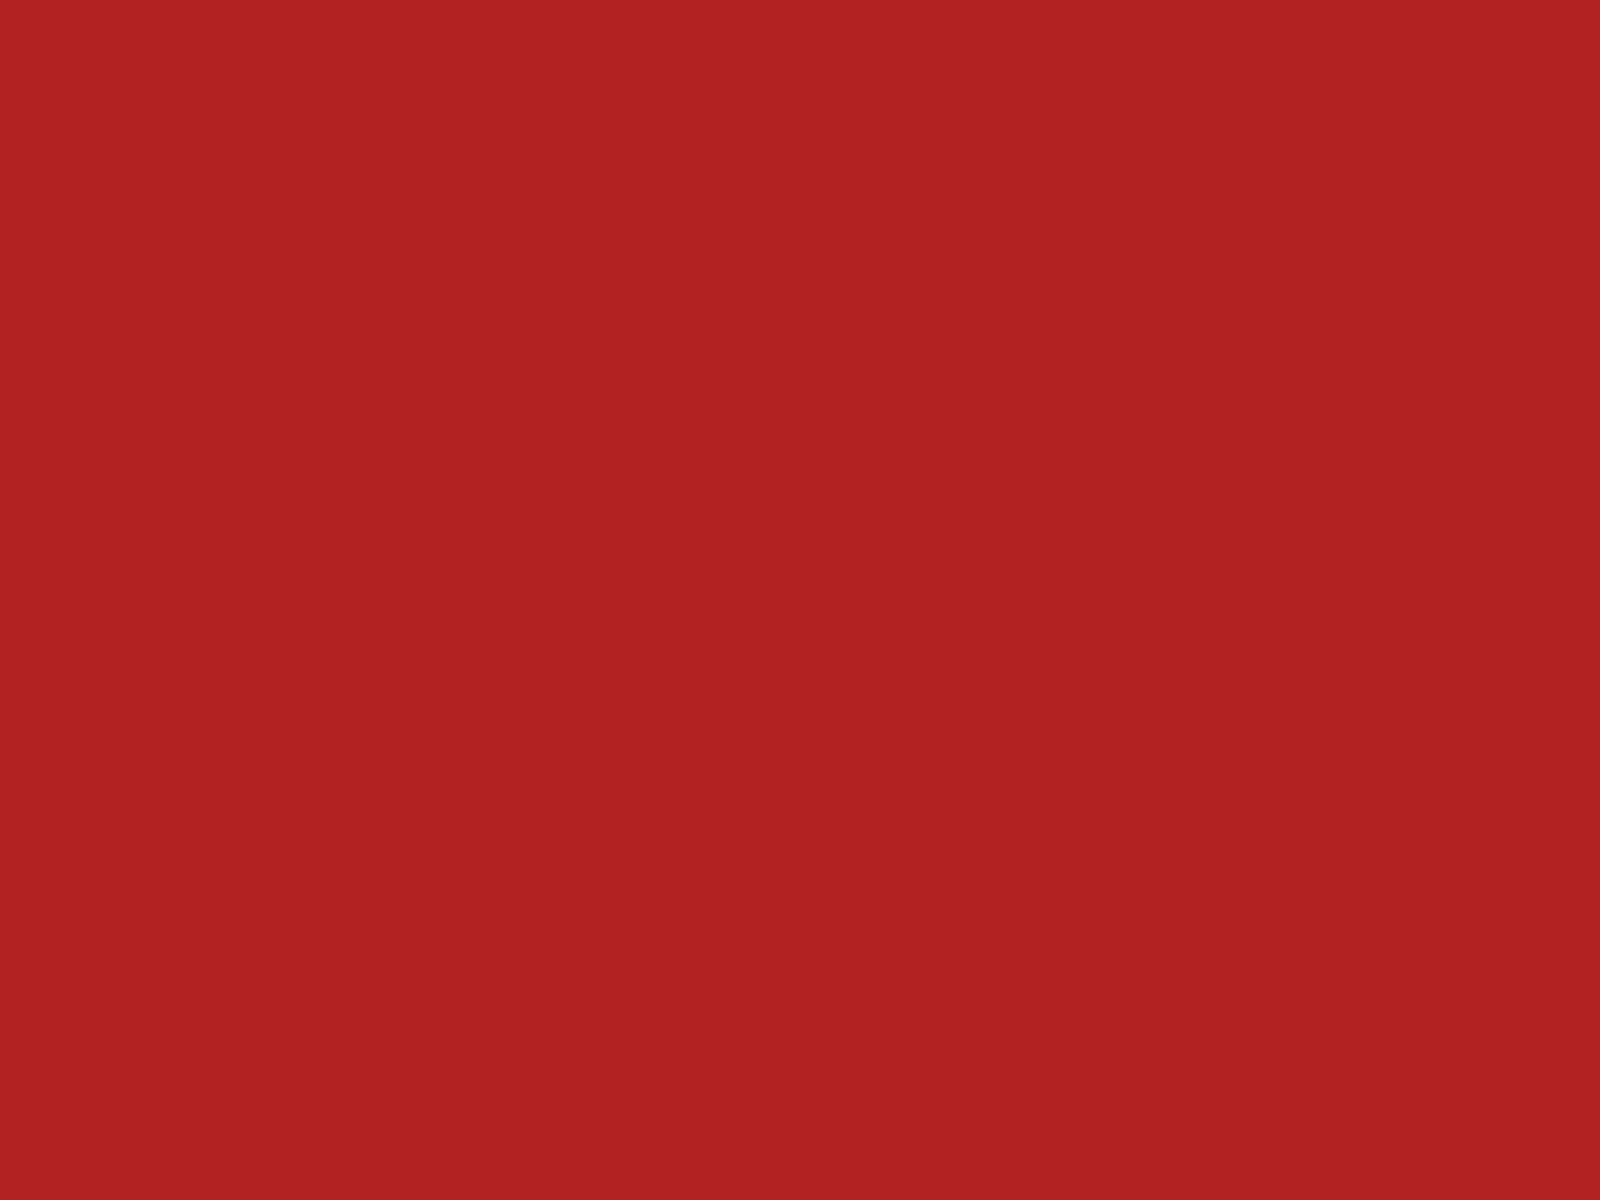 1600x1200 Firebrick Solid Color Background